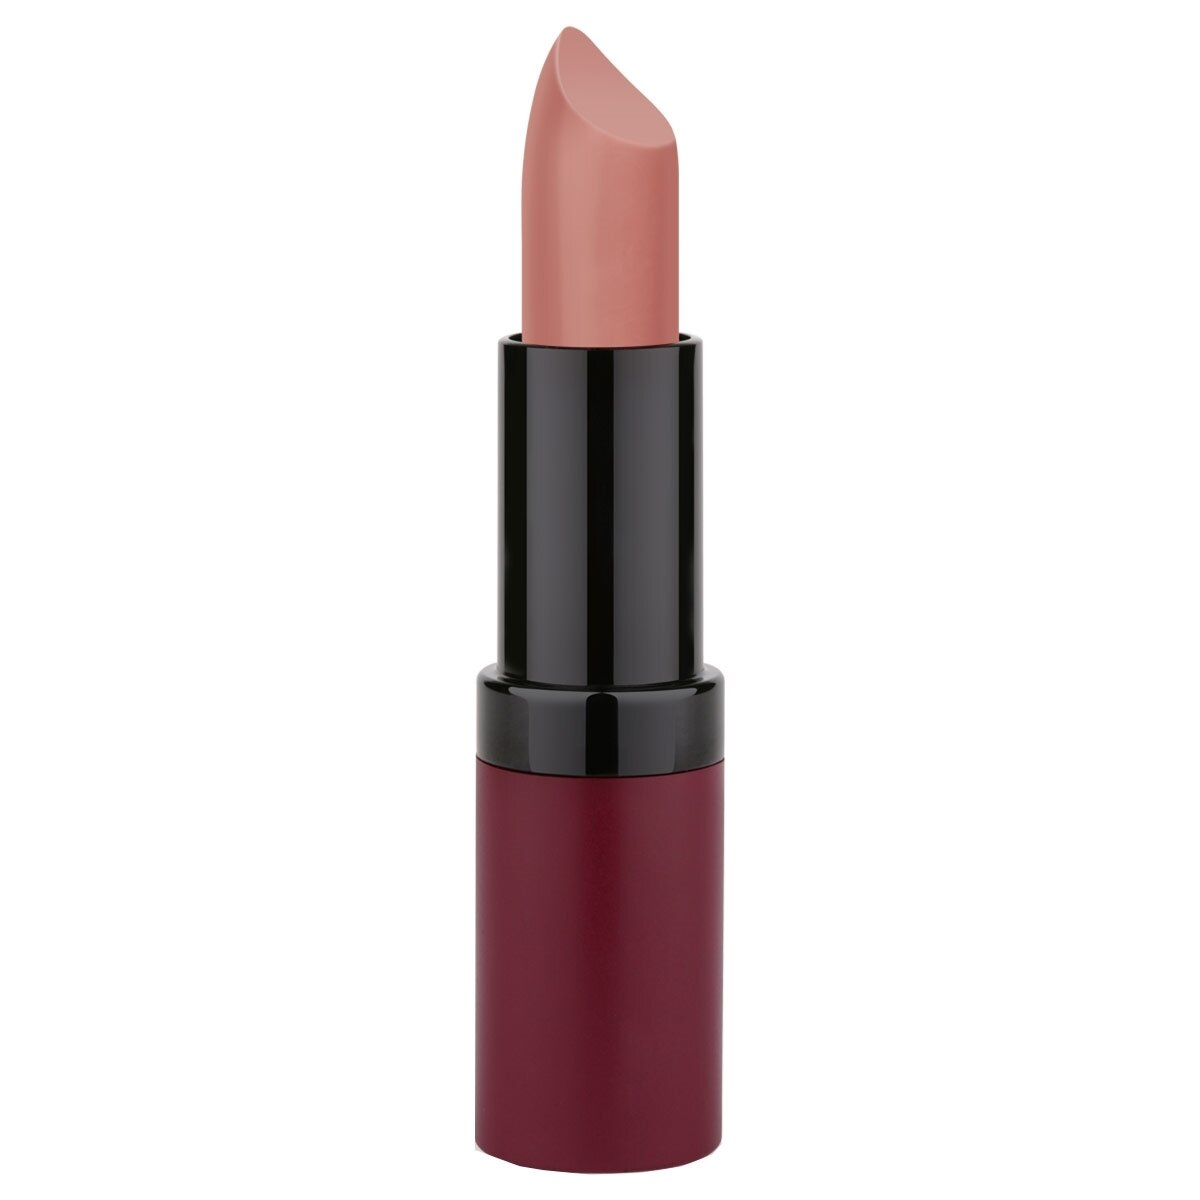 Velvet Matte Lipstick Ruj No. 01